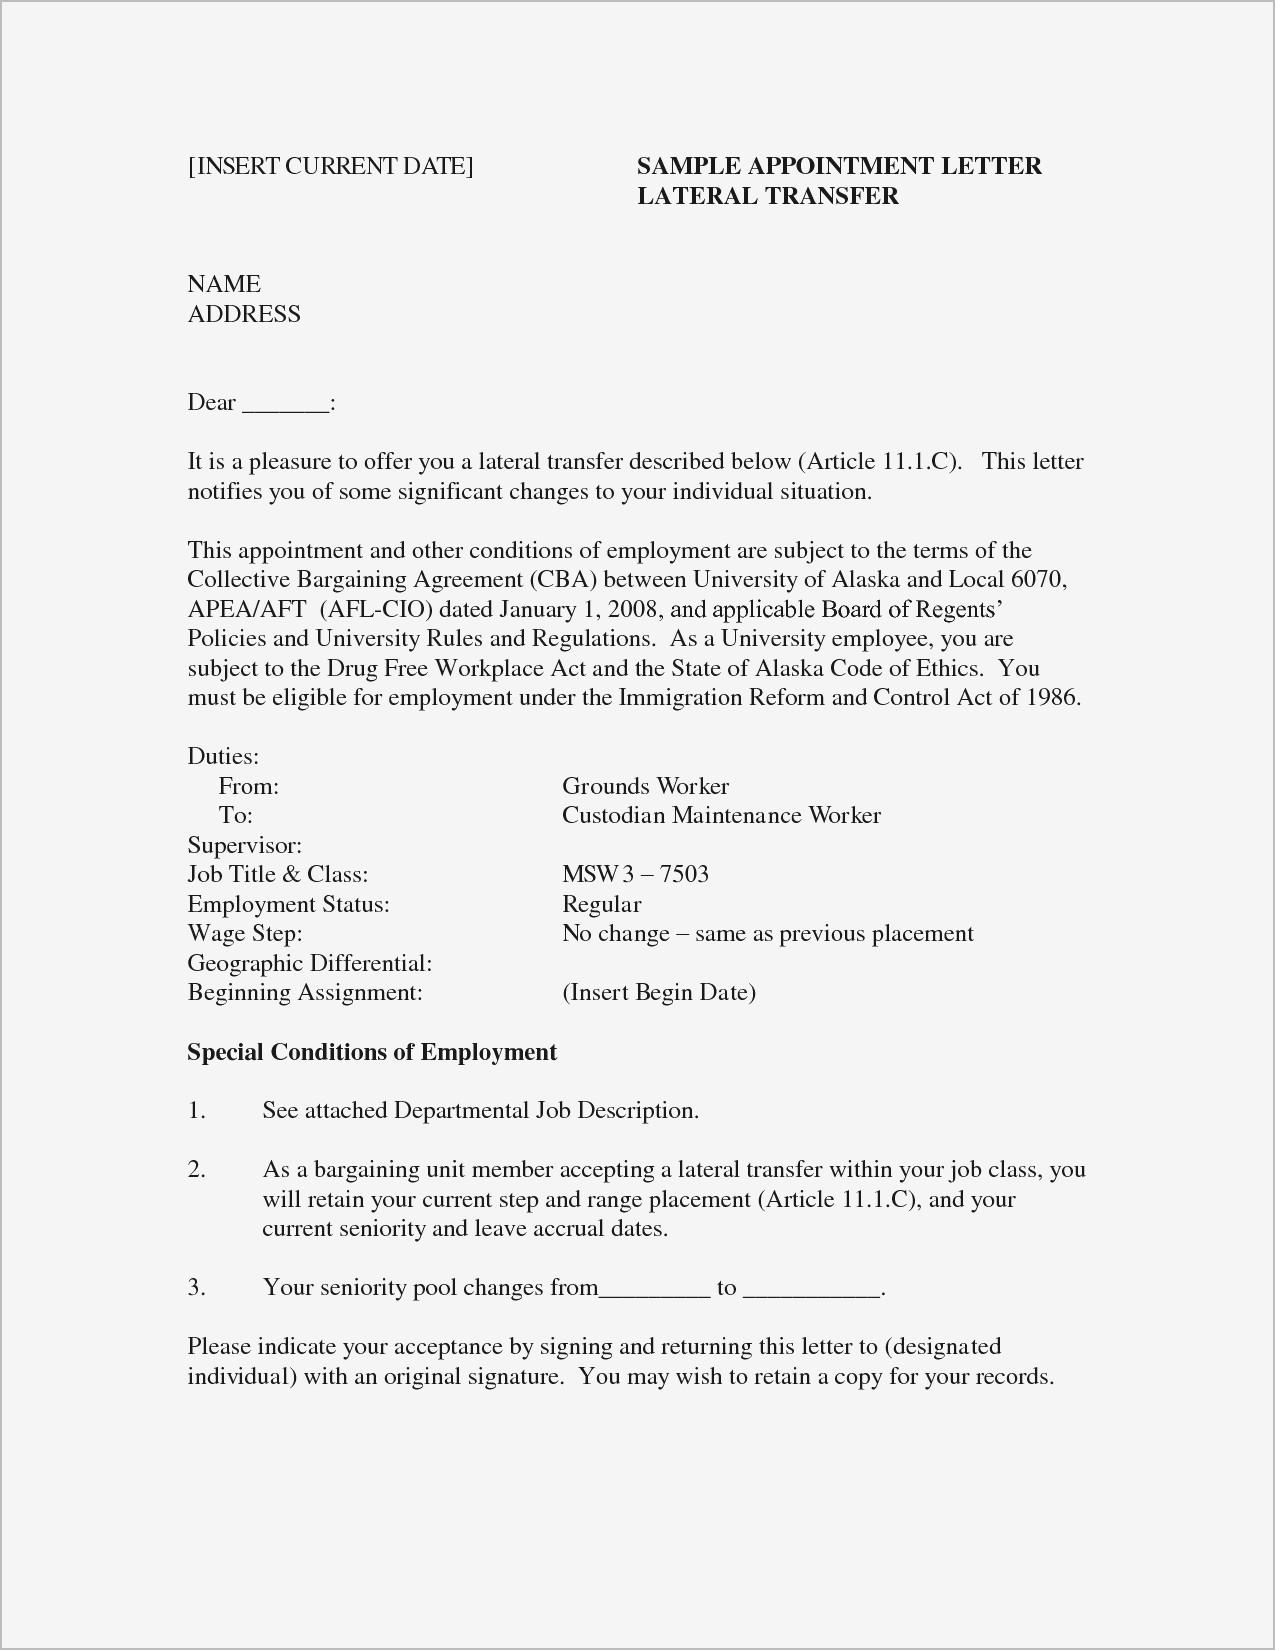 Official Job Offer Letter Template - formal Fer Letter Inspirational Job Fer Letter Template Us Copy Od